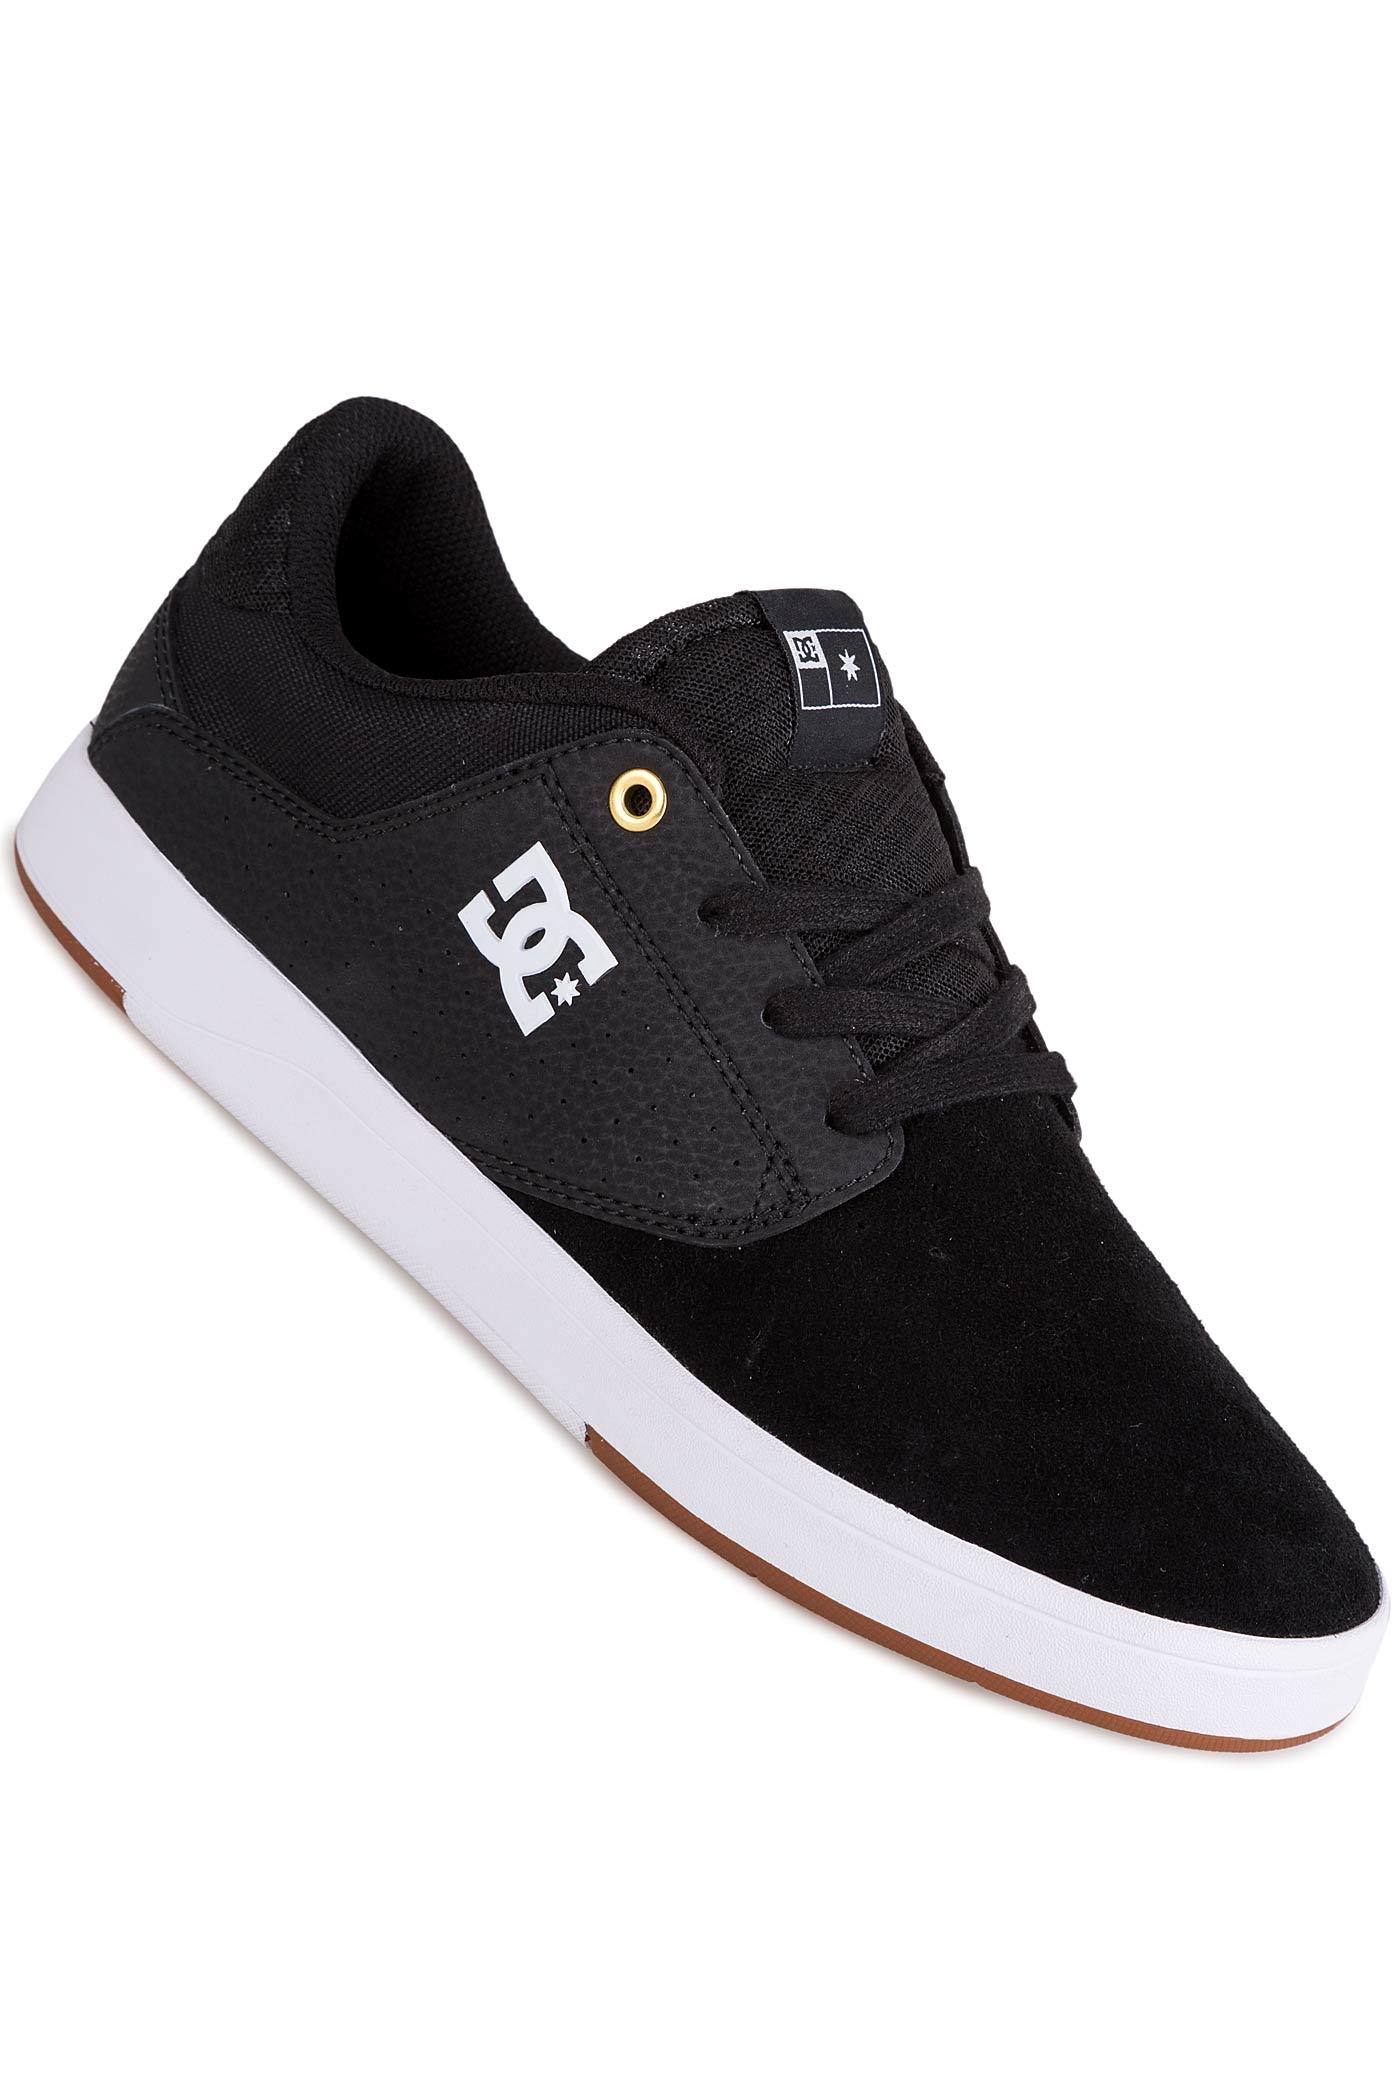 Dc Plaza Tc S Shoe